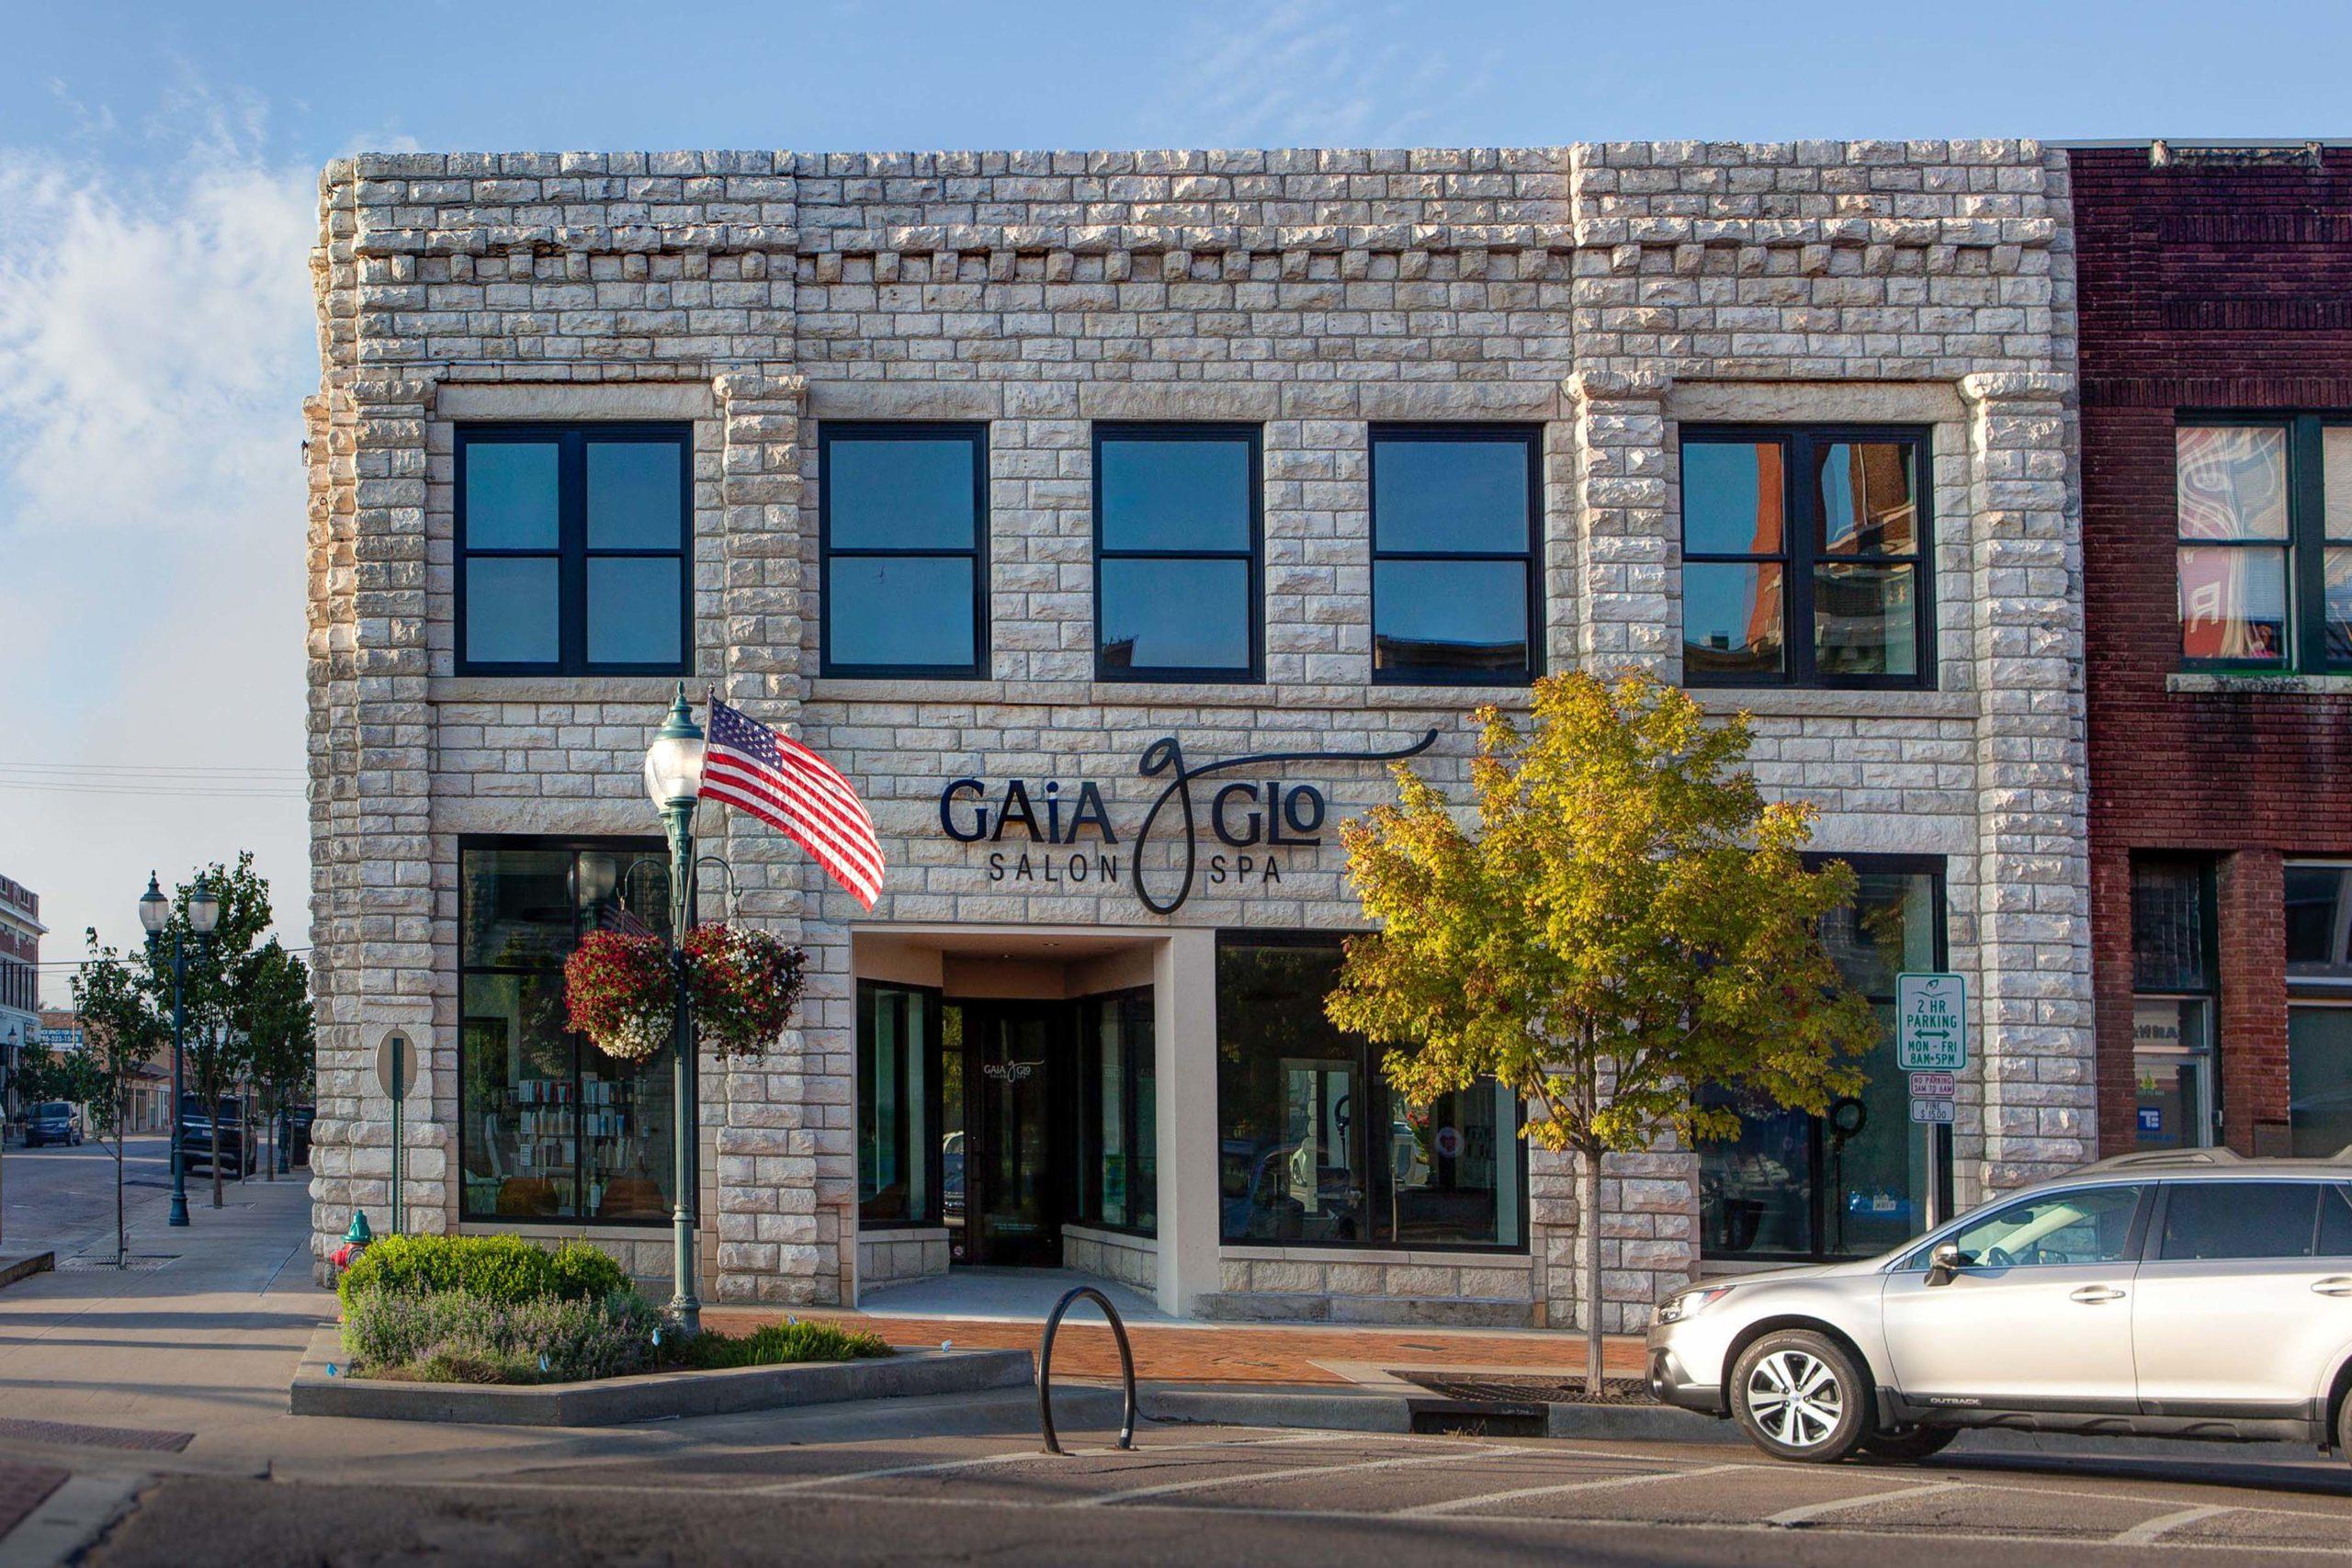 401 Poyntz Ave. – Gaia Salon